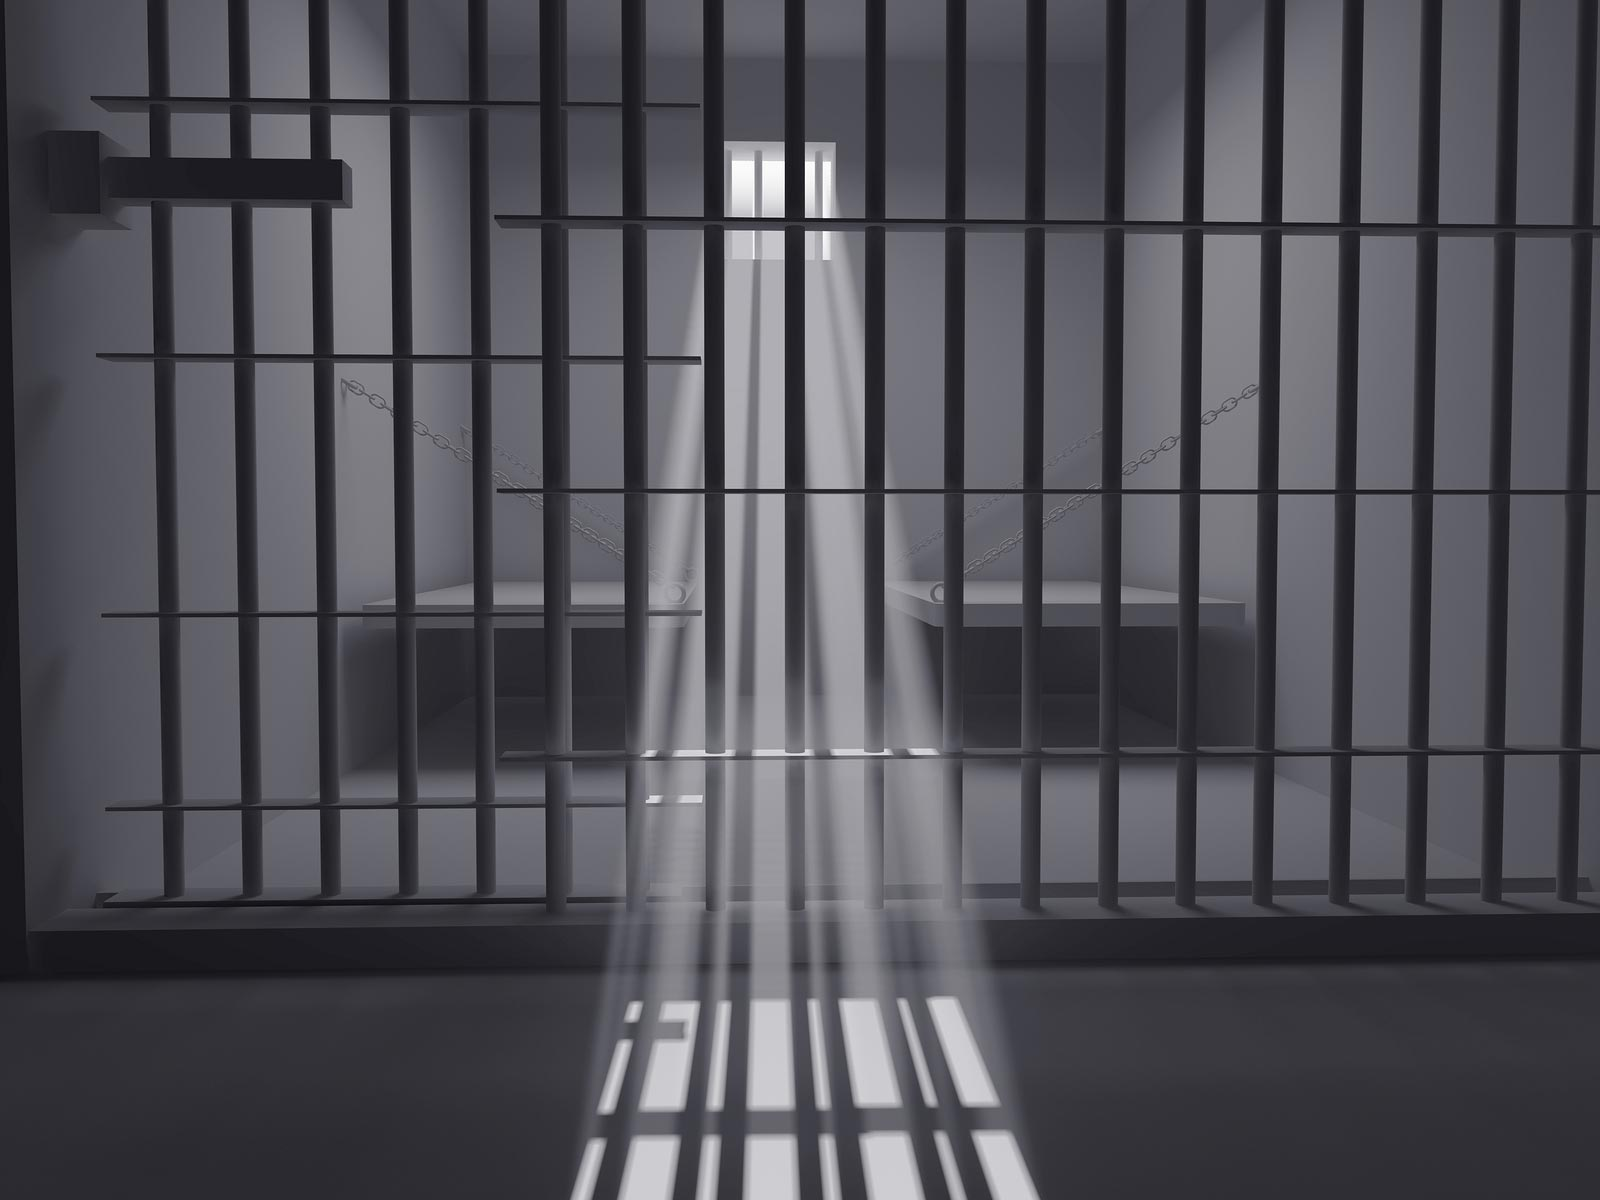 Related Jail Wallpaper Jail Background Prison Wallpaper 1600x1200